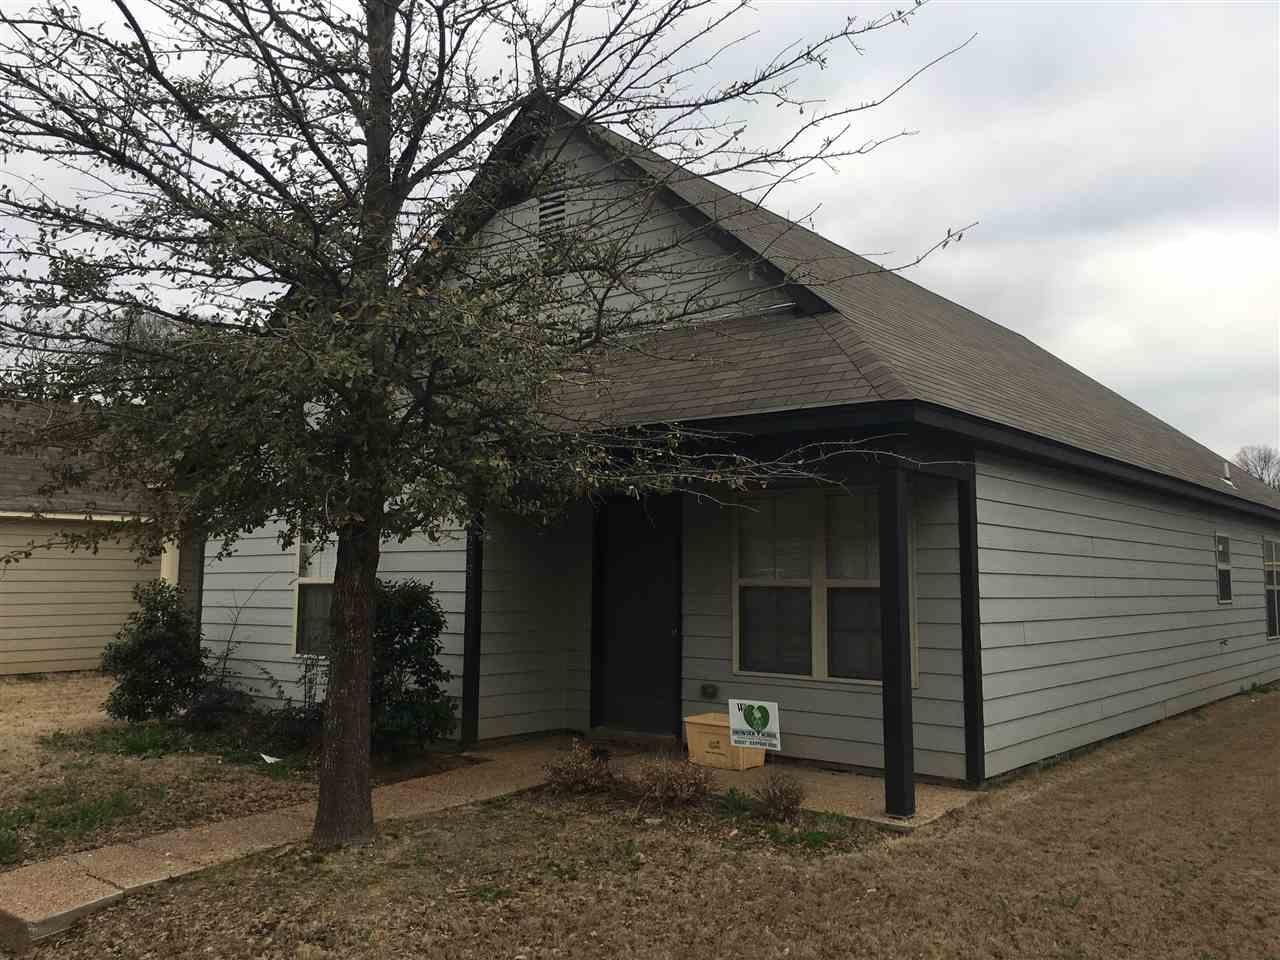 298 N CLAYBROOK ST, Memphis, TN 38104